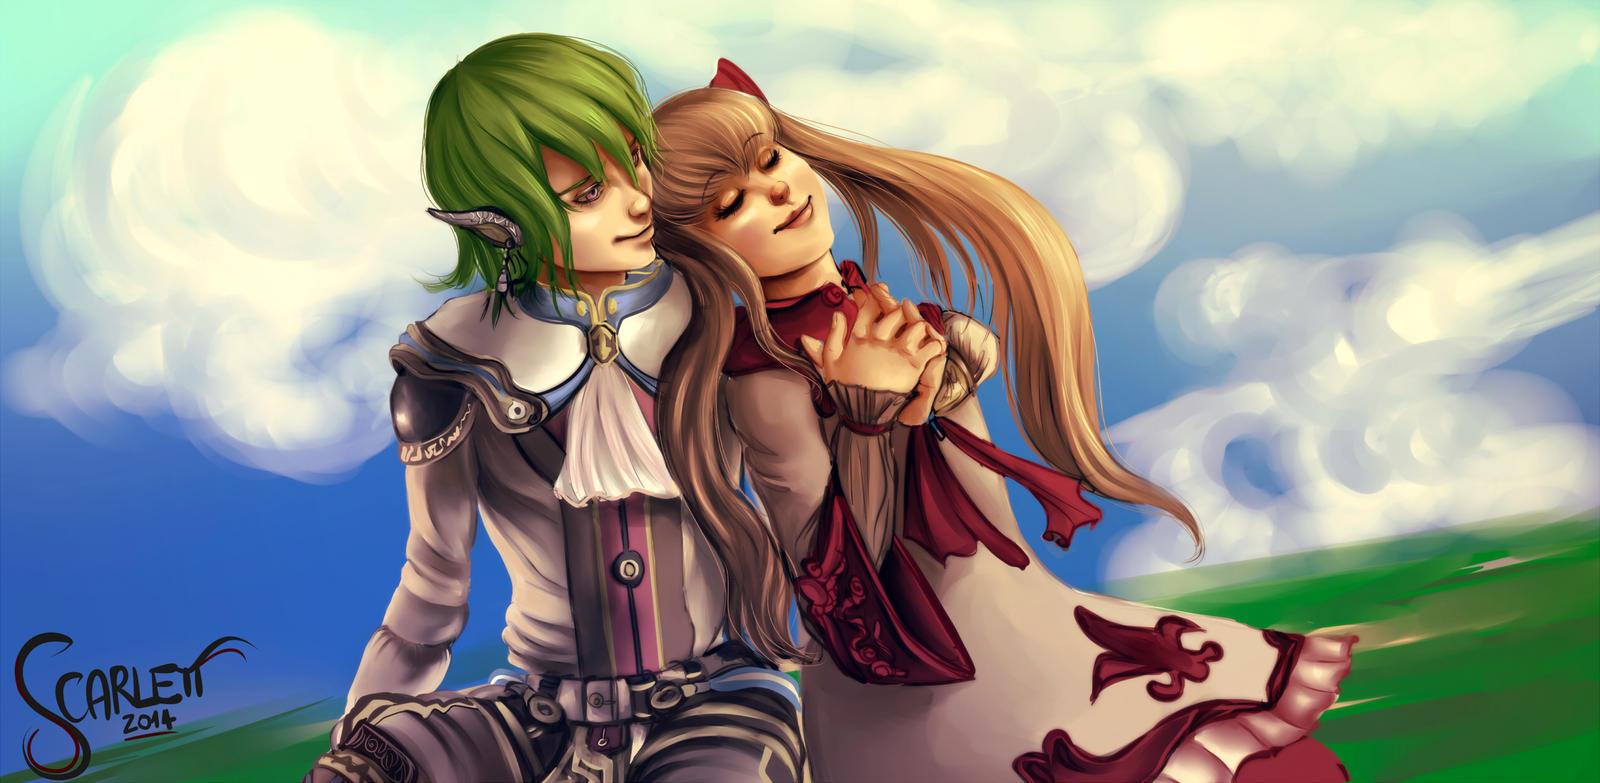 faize and lymle ending a relationship